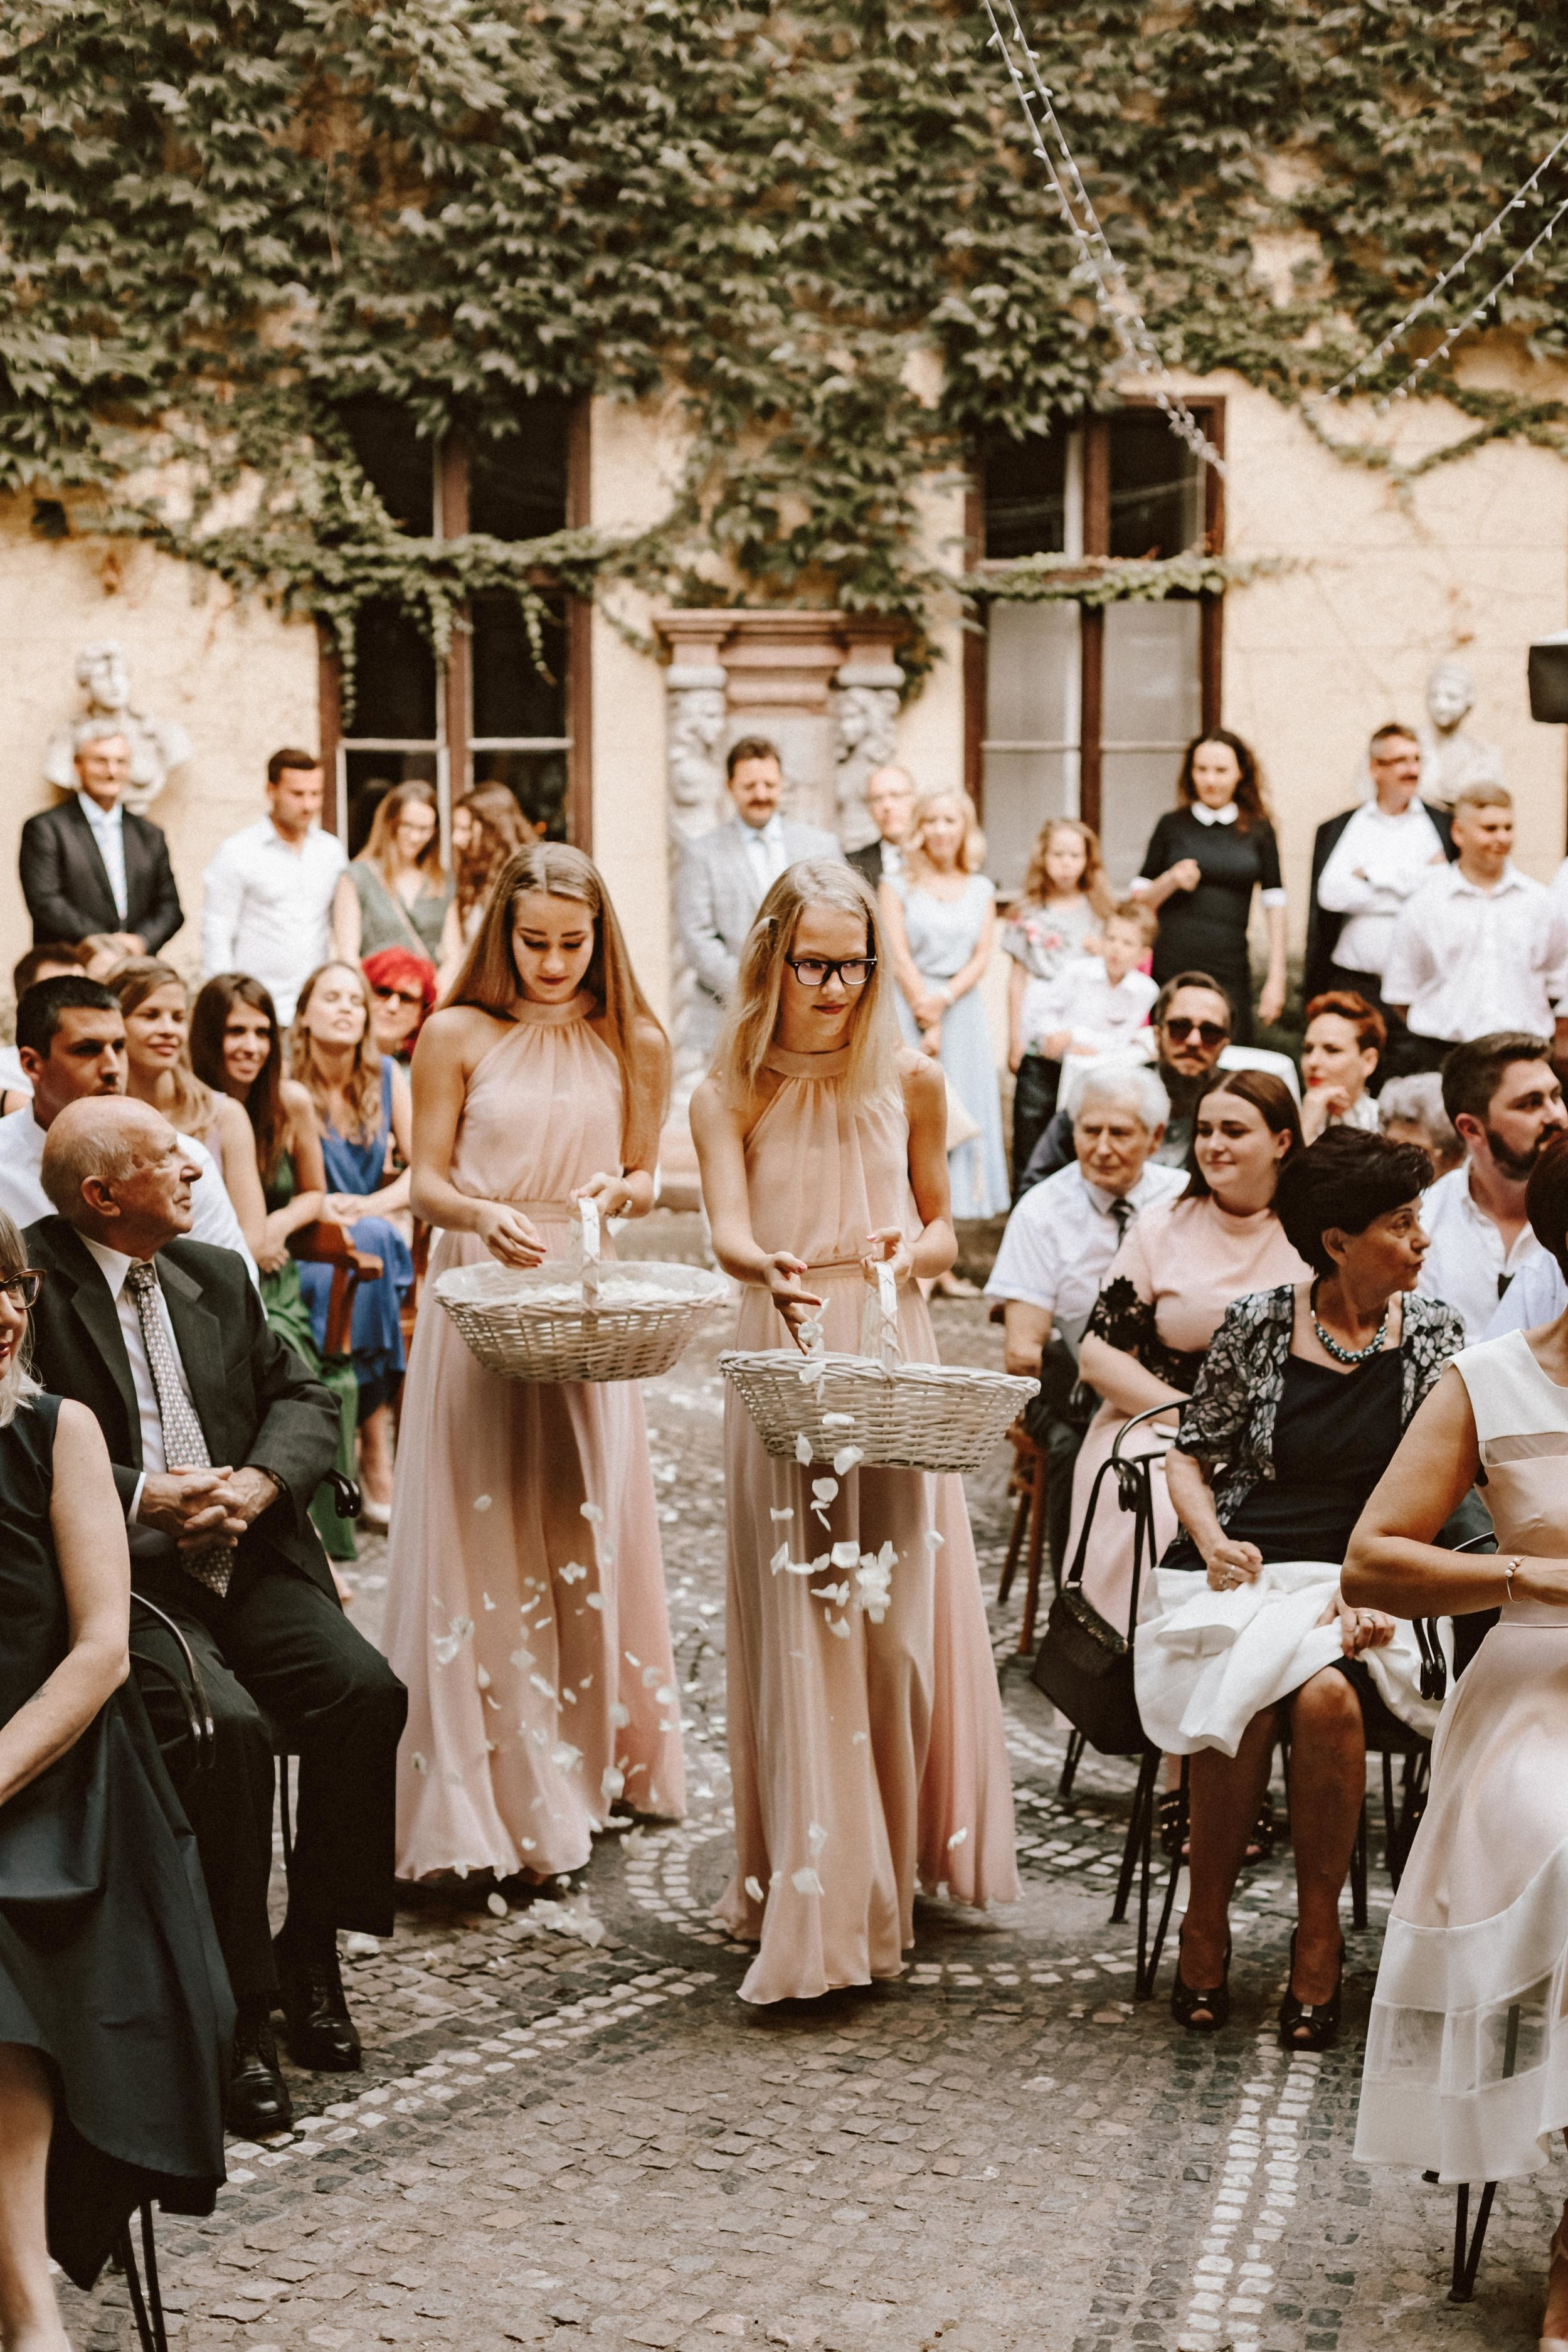 1819-Evelin+Peti-wedding-226-w.jpg